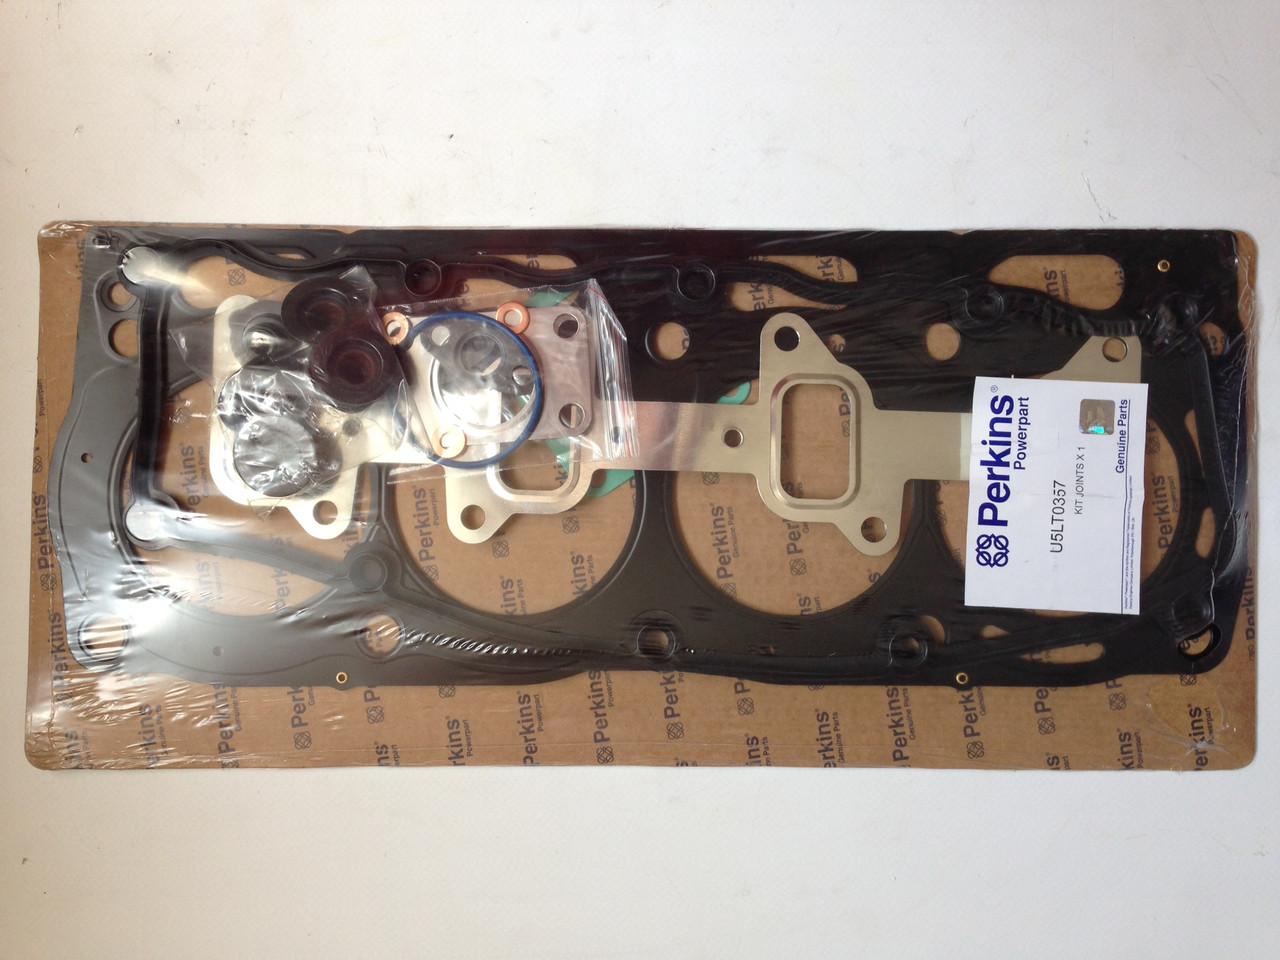 Комплект прокладок верхний Perkins 1104 U5LT0357, 4225163M91